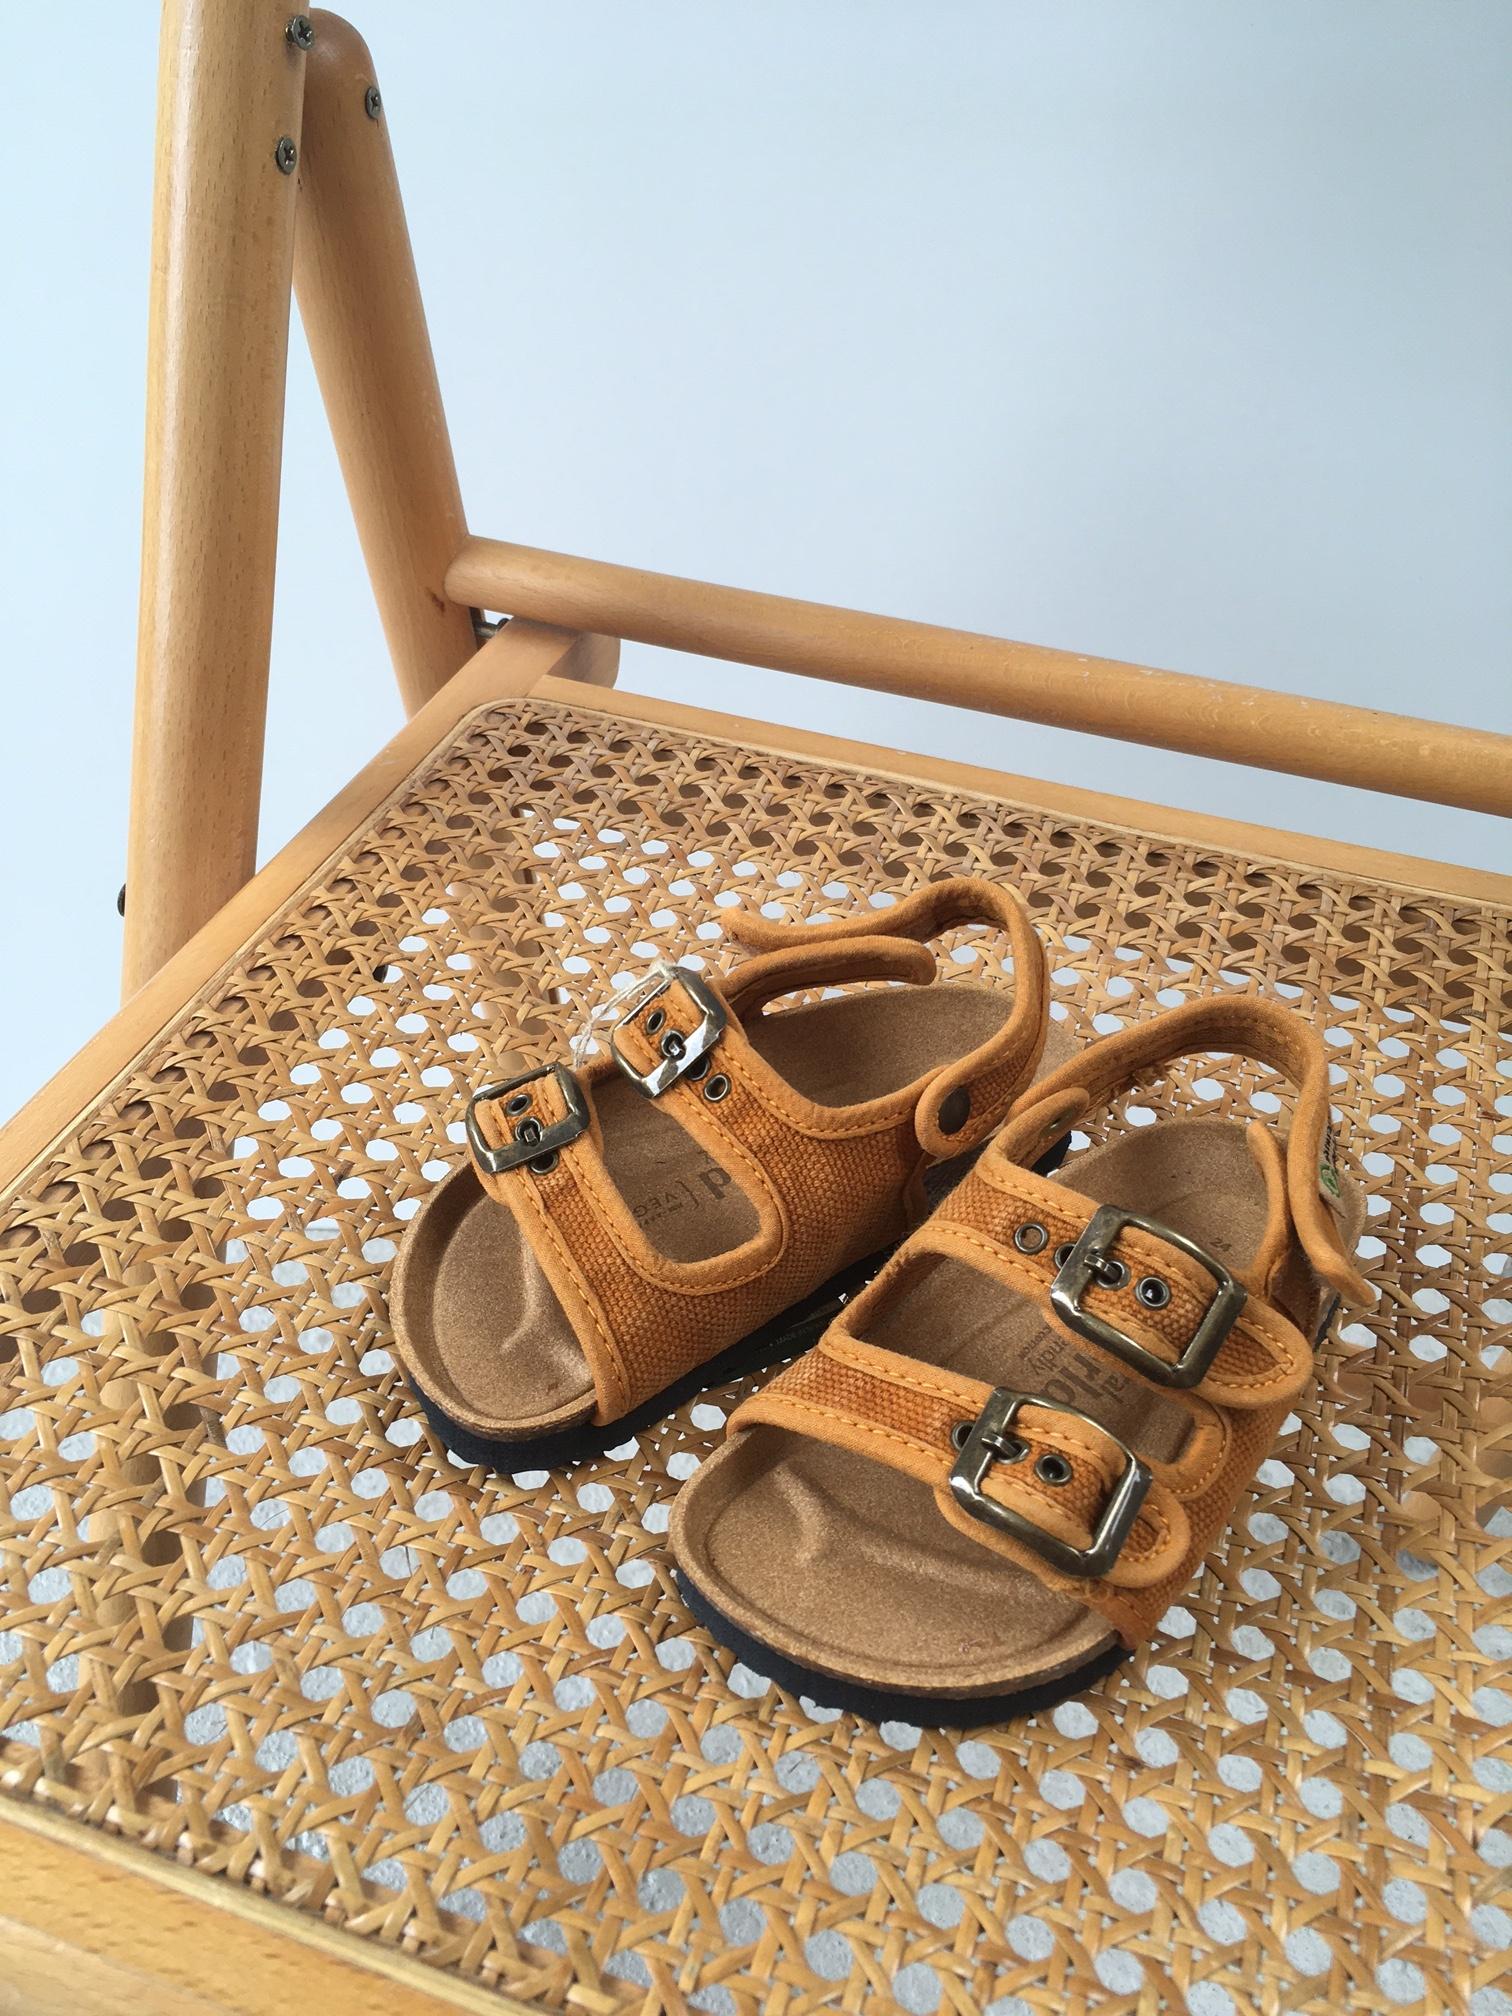 NATURAL WORLD vegan bio children's sandal BEACH DUO - organic cotton / cork - stone washed ochre - 24 to 34